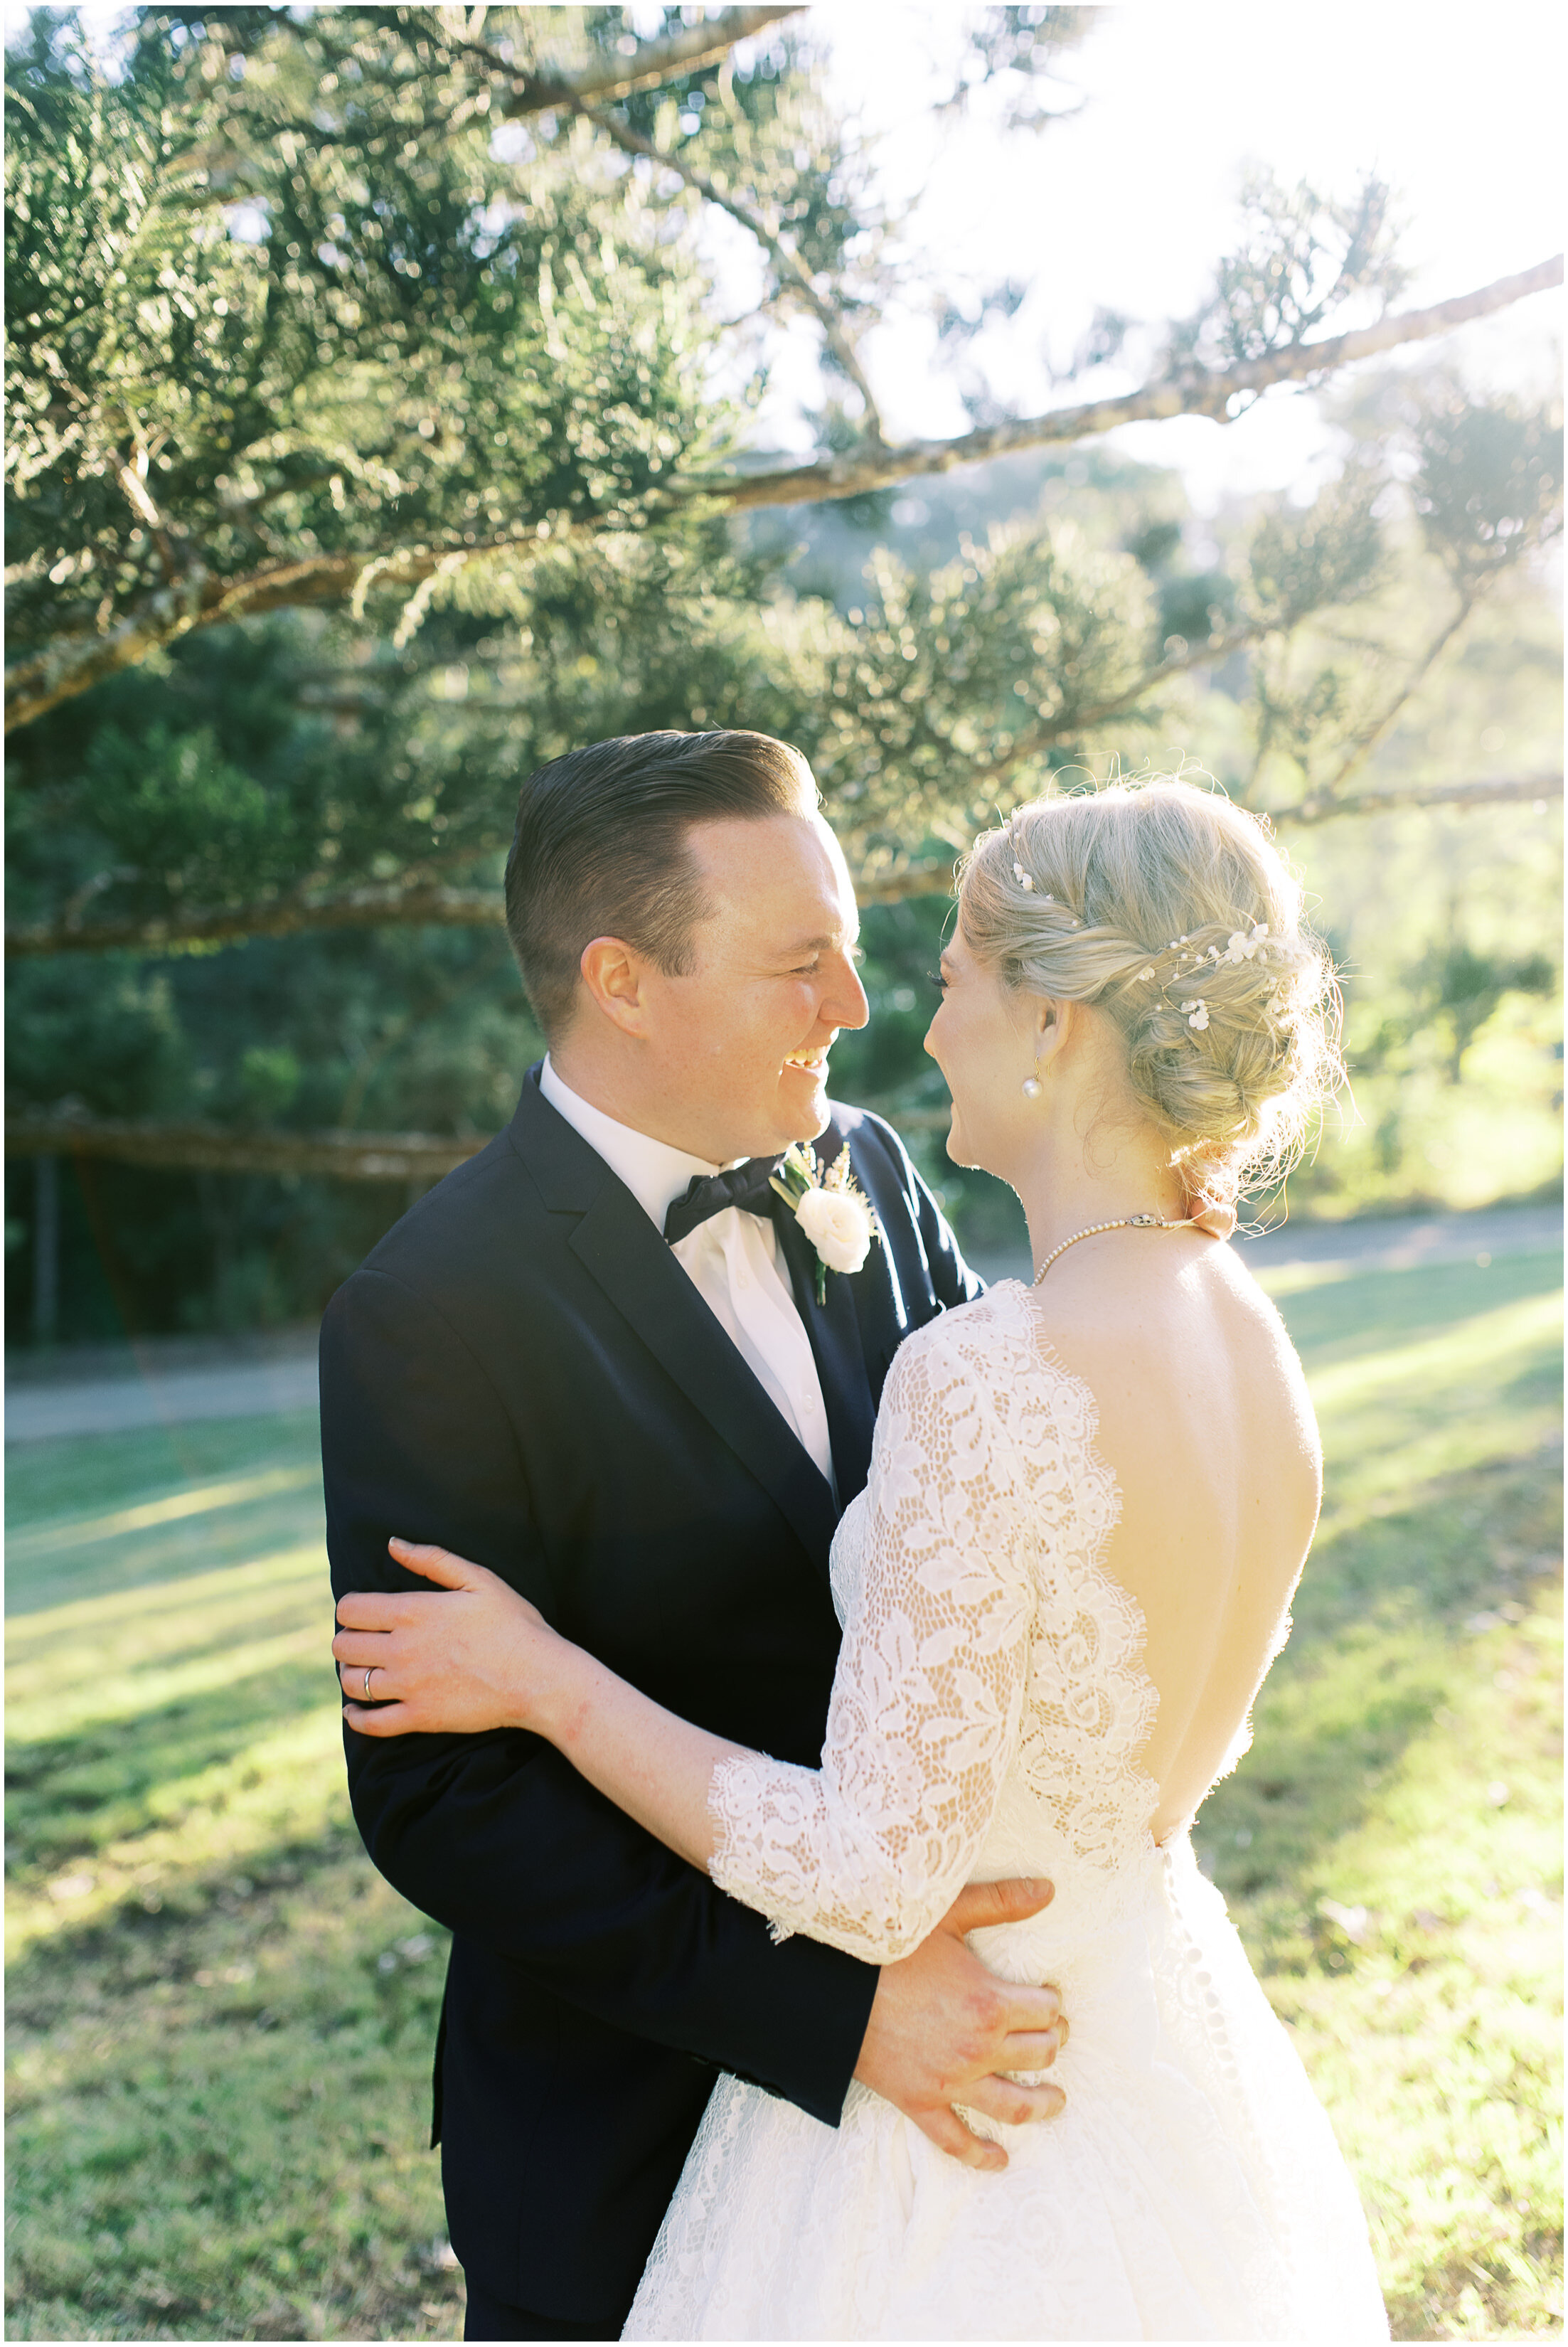 brisbane-fine-art-wedding-photographer-lauren-olivia-luxury-wedding-australia-31.jpg